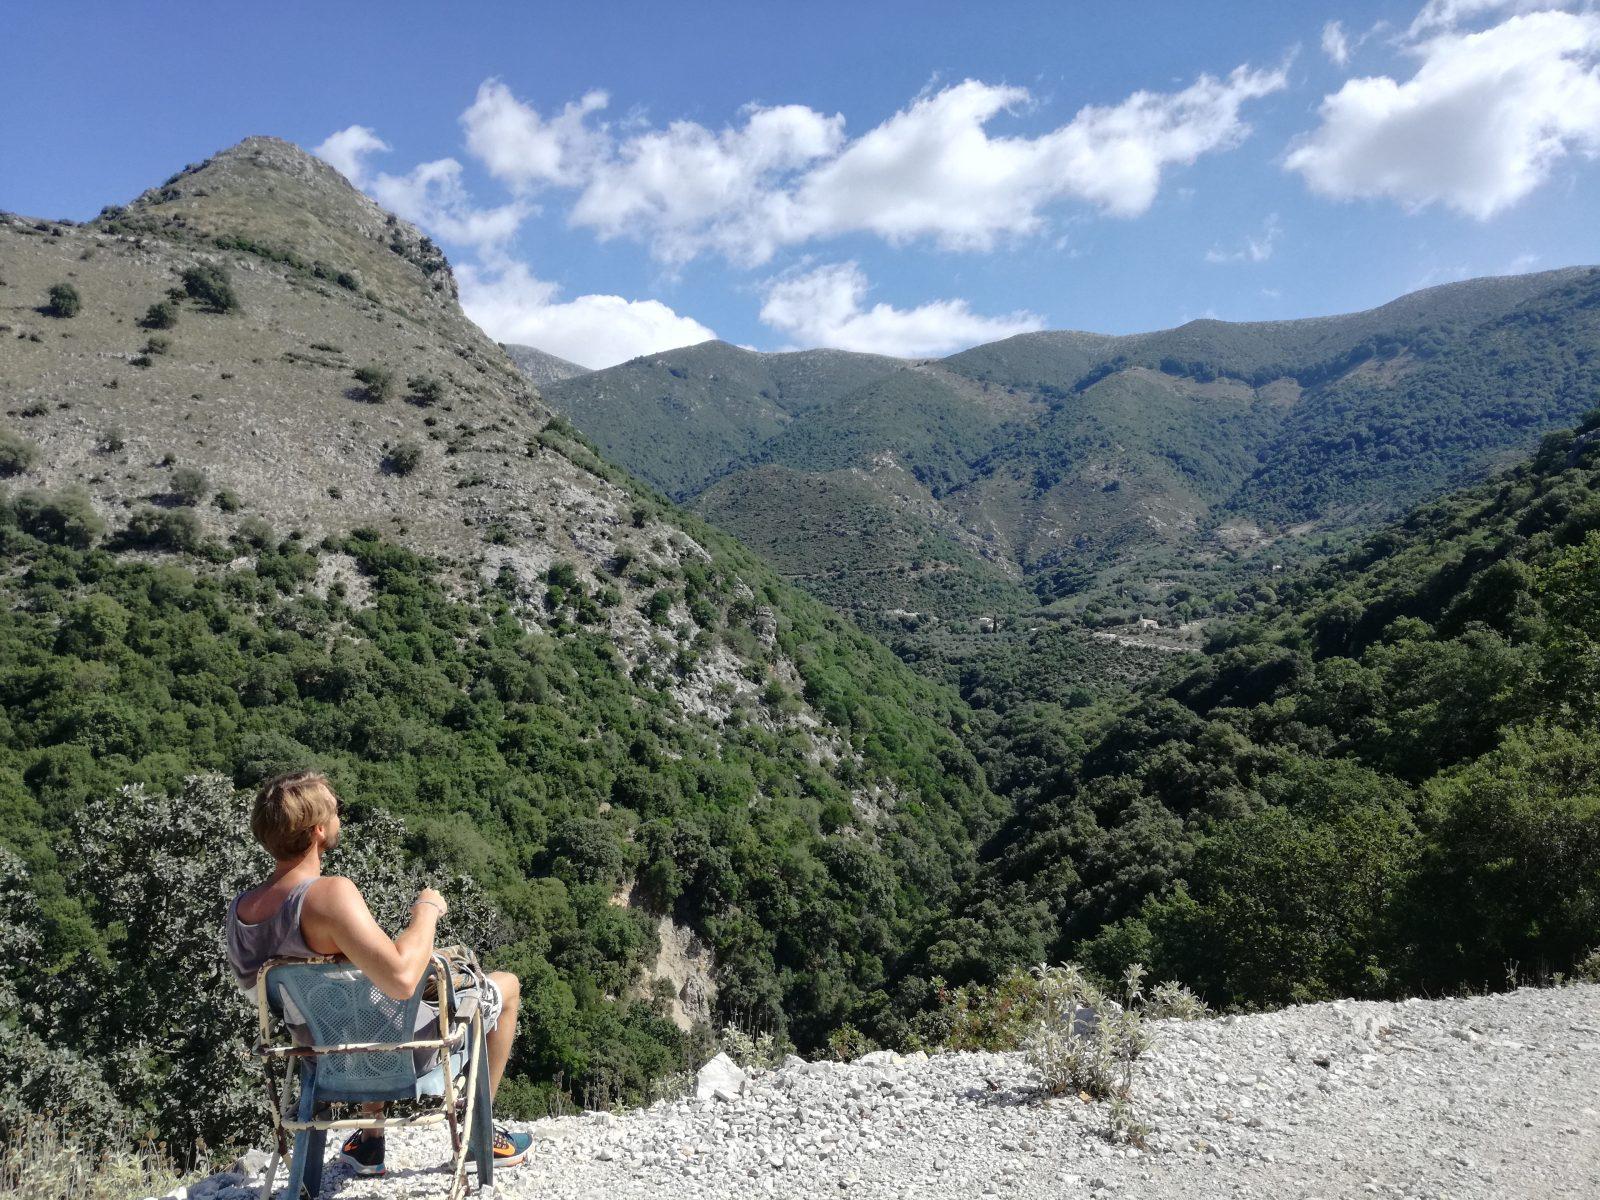 Offroad in Griechenland - Kurze Wanderpause in den souliotischen Bergen.